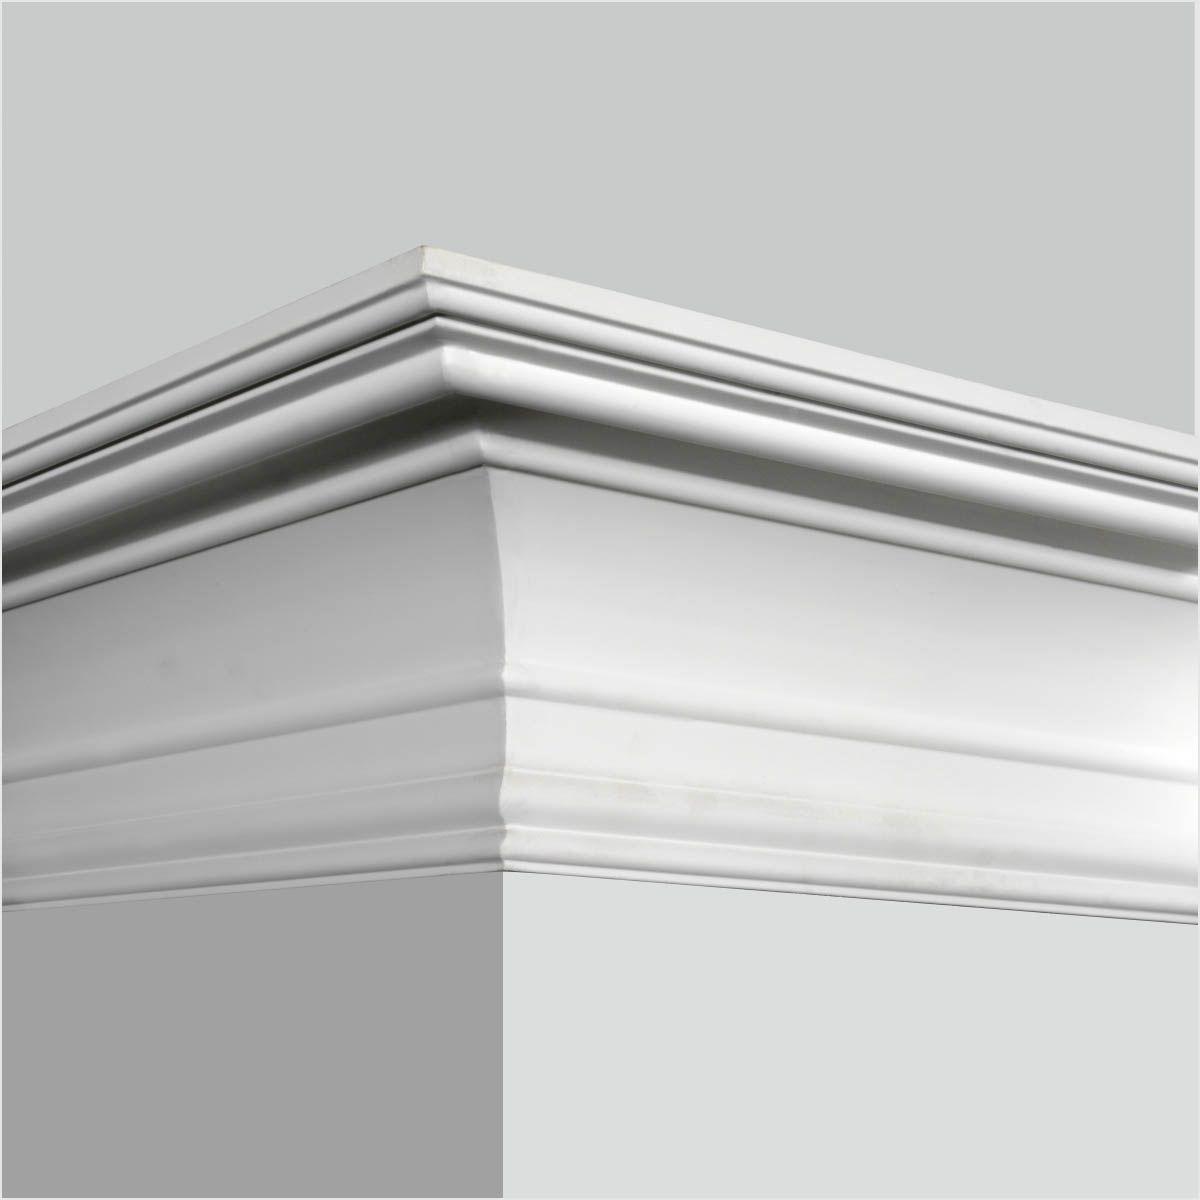 Polyurethane simple crown molding for sale moldings casings trim